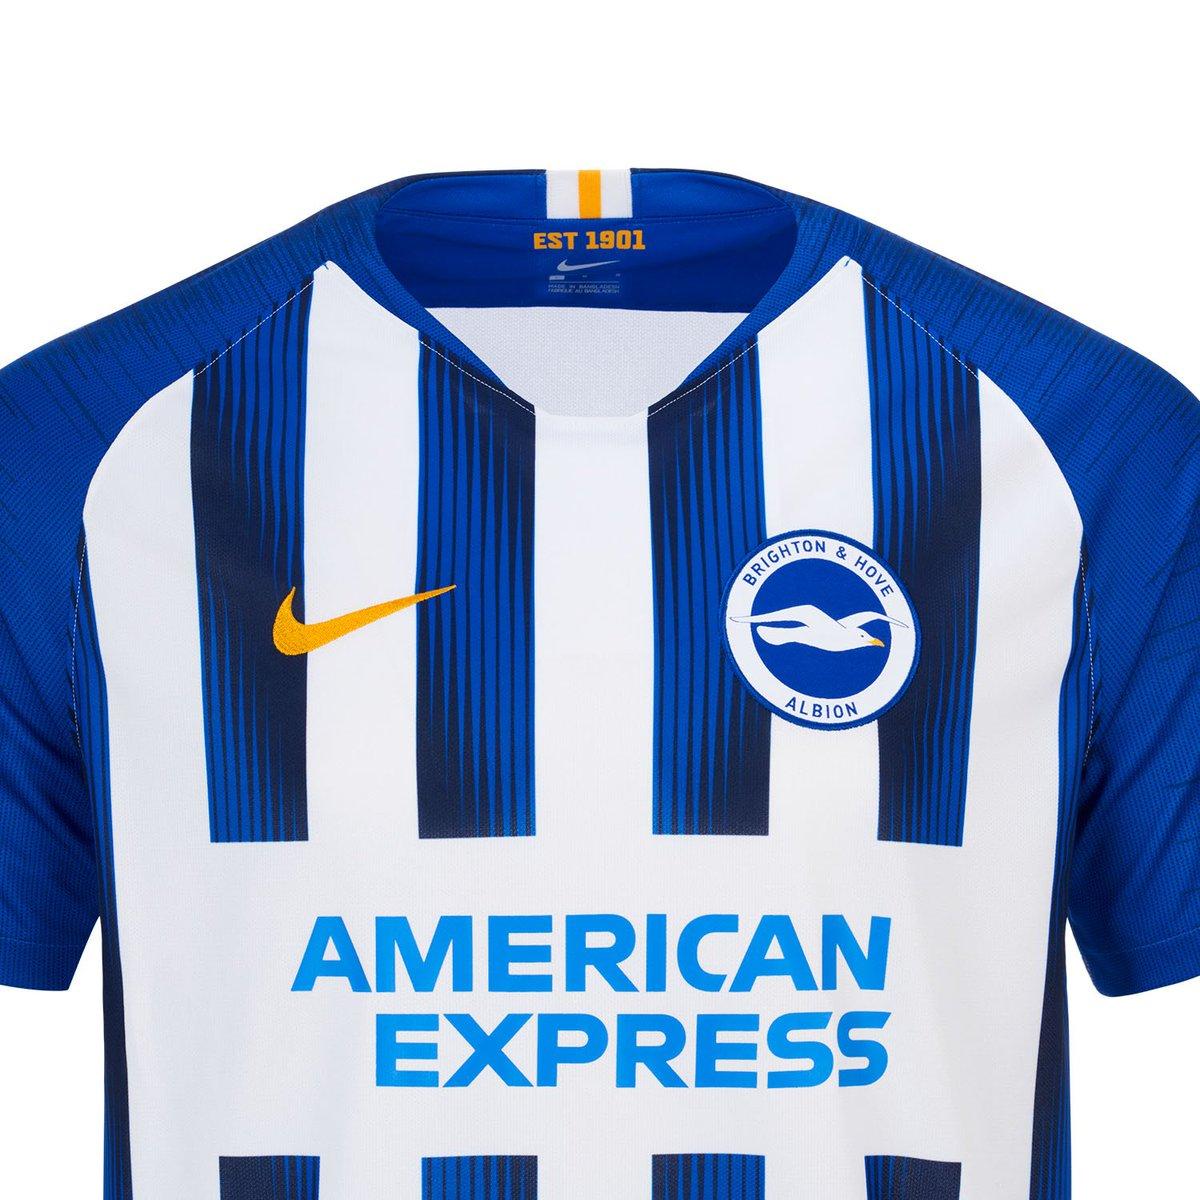 0c7cc542336 See more here: https://www.footballshirts.com/brighton-shirt.html  …pic.twitter.com/3WCiNo0DDs